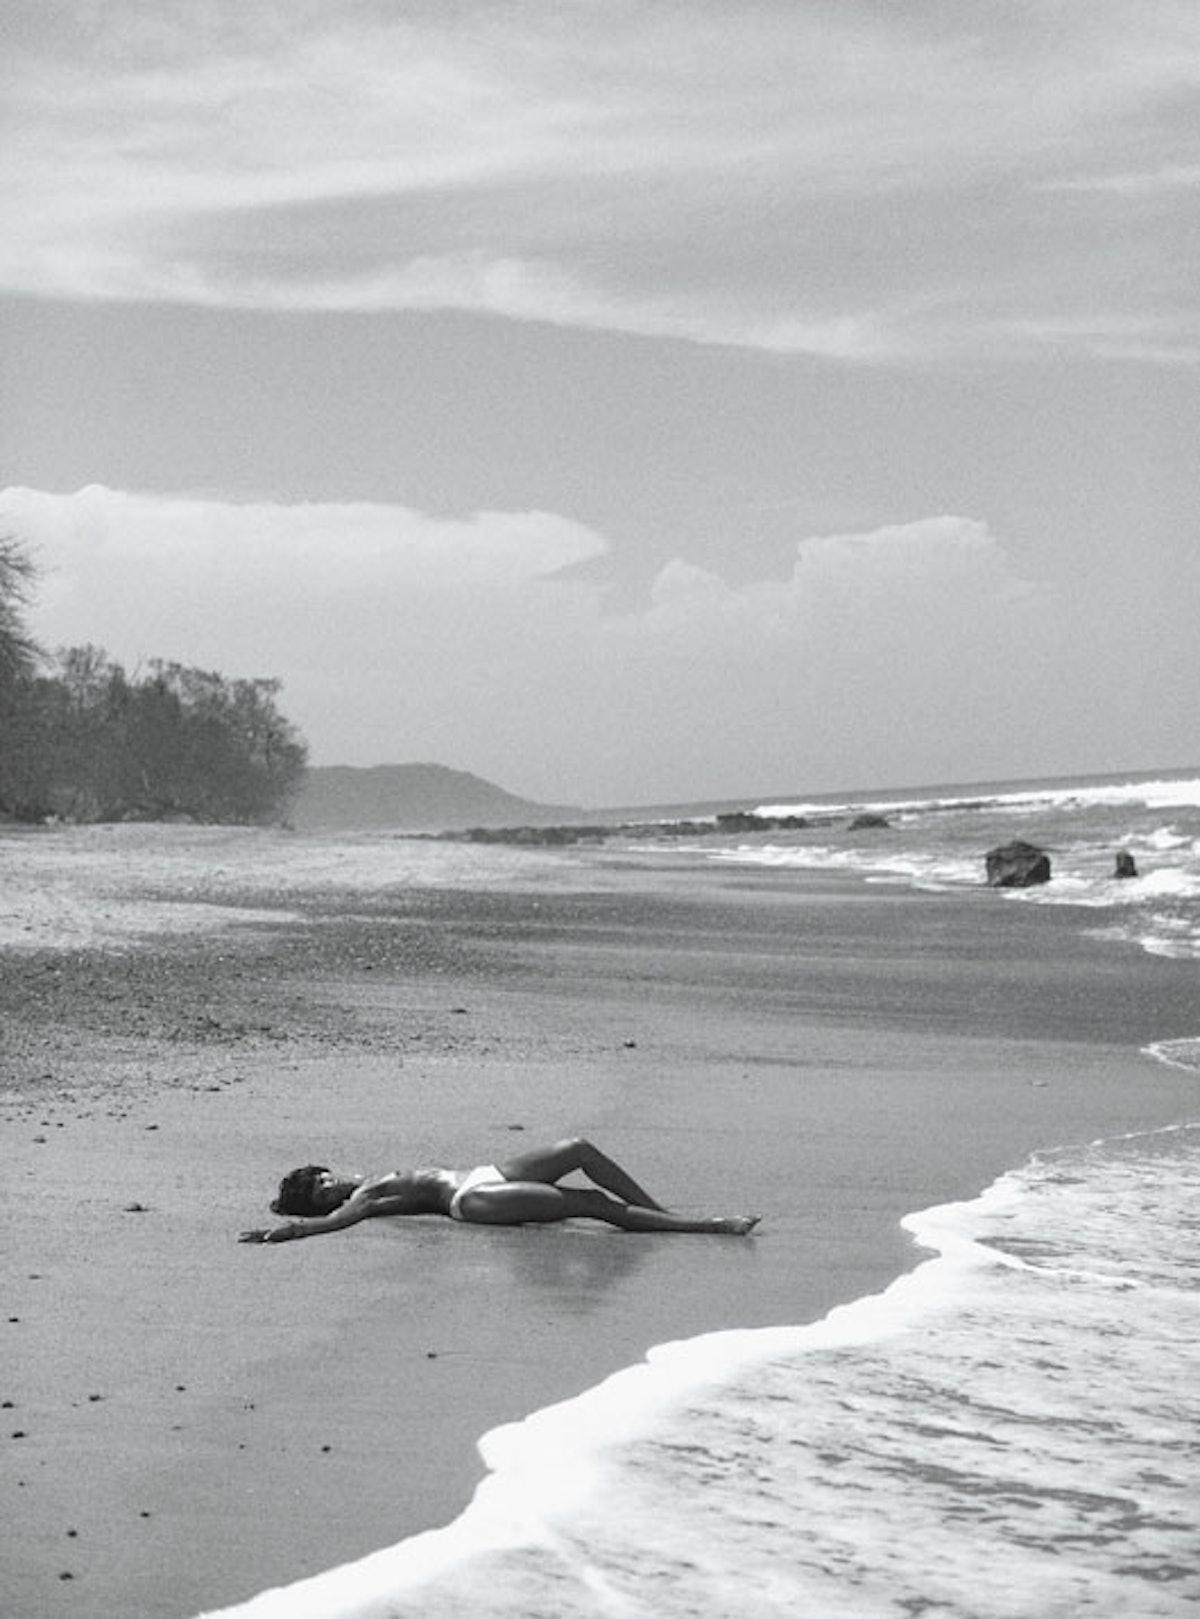 fass-costa-rica-chic-08-l.jpg